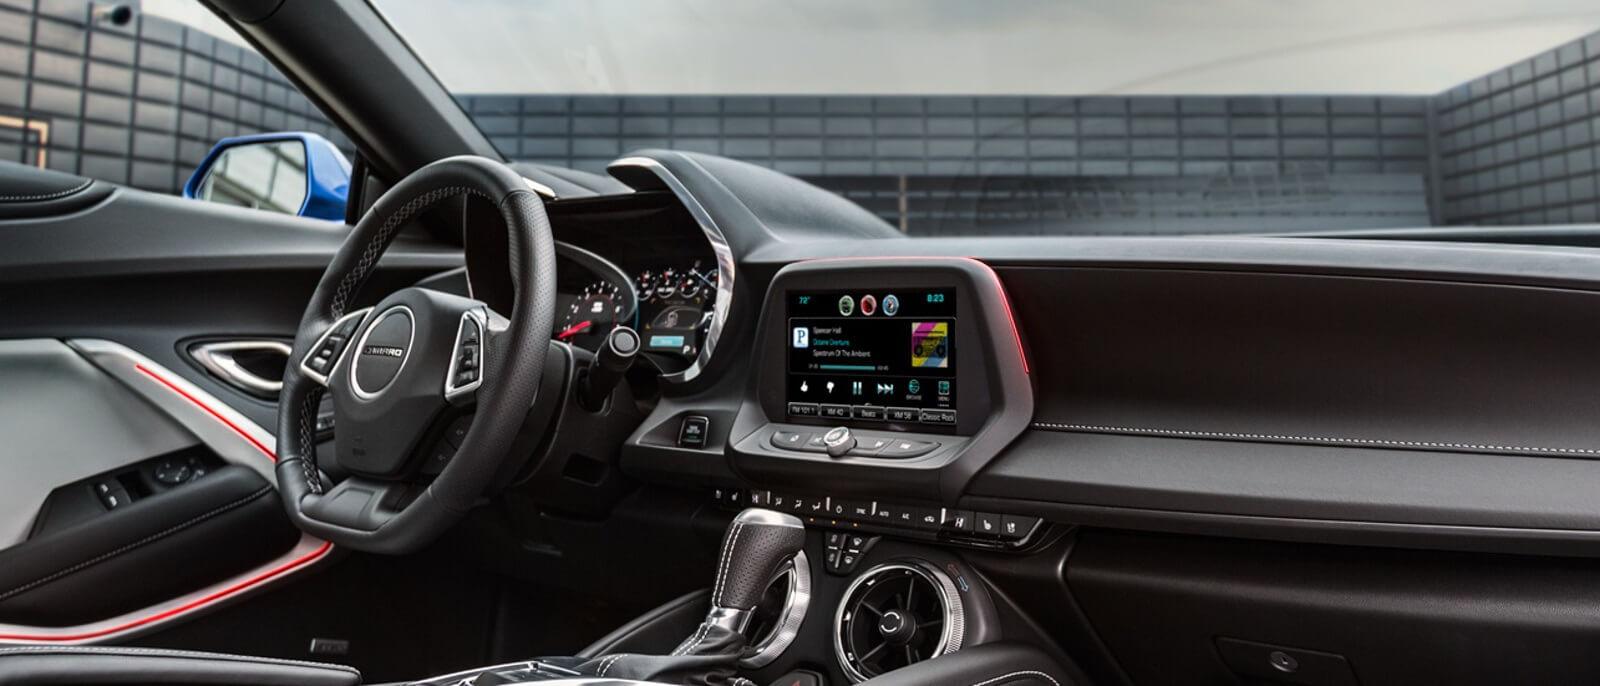 2016 Chevrolet Camaro Interior ...